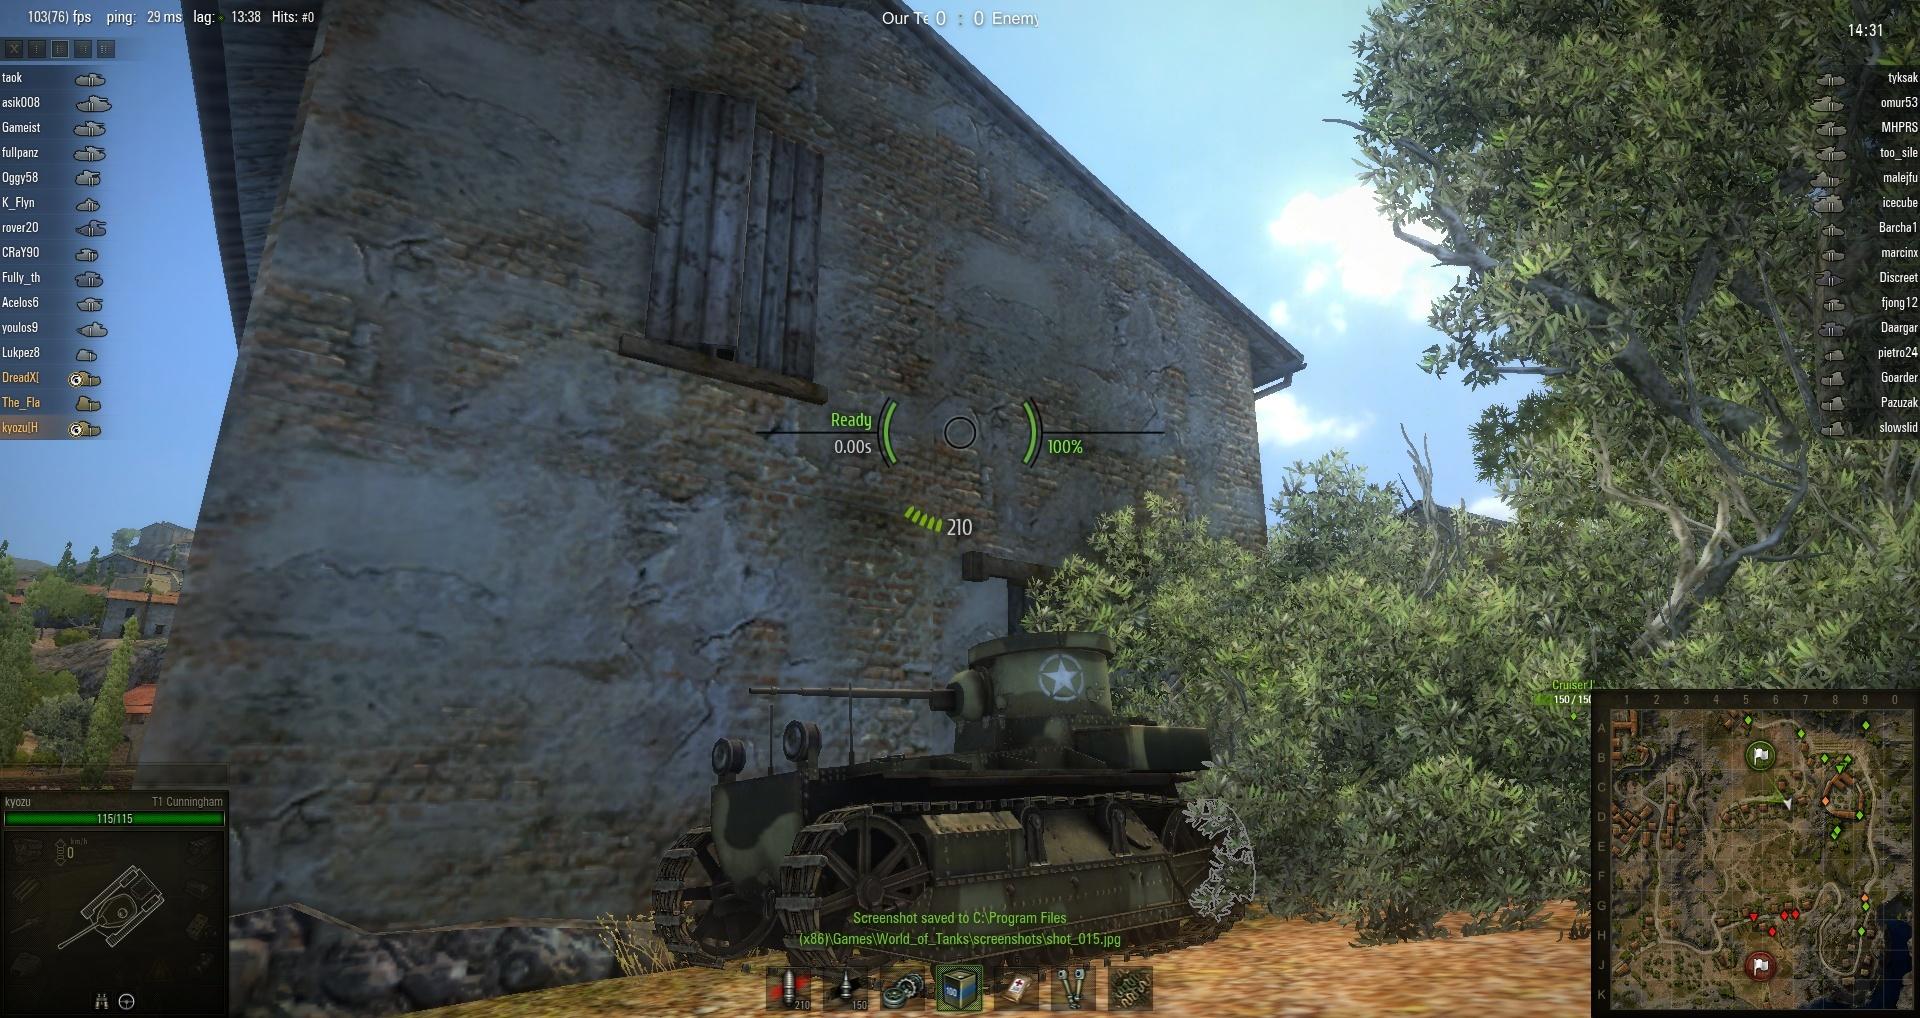 Wereld van tanks matchmaking grafiek 8,10